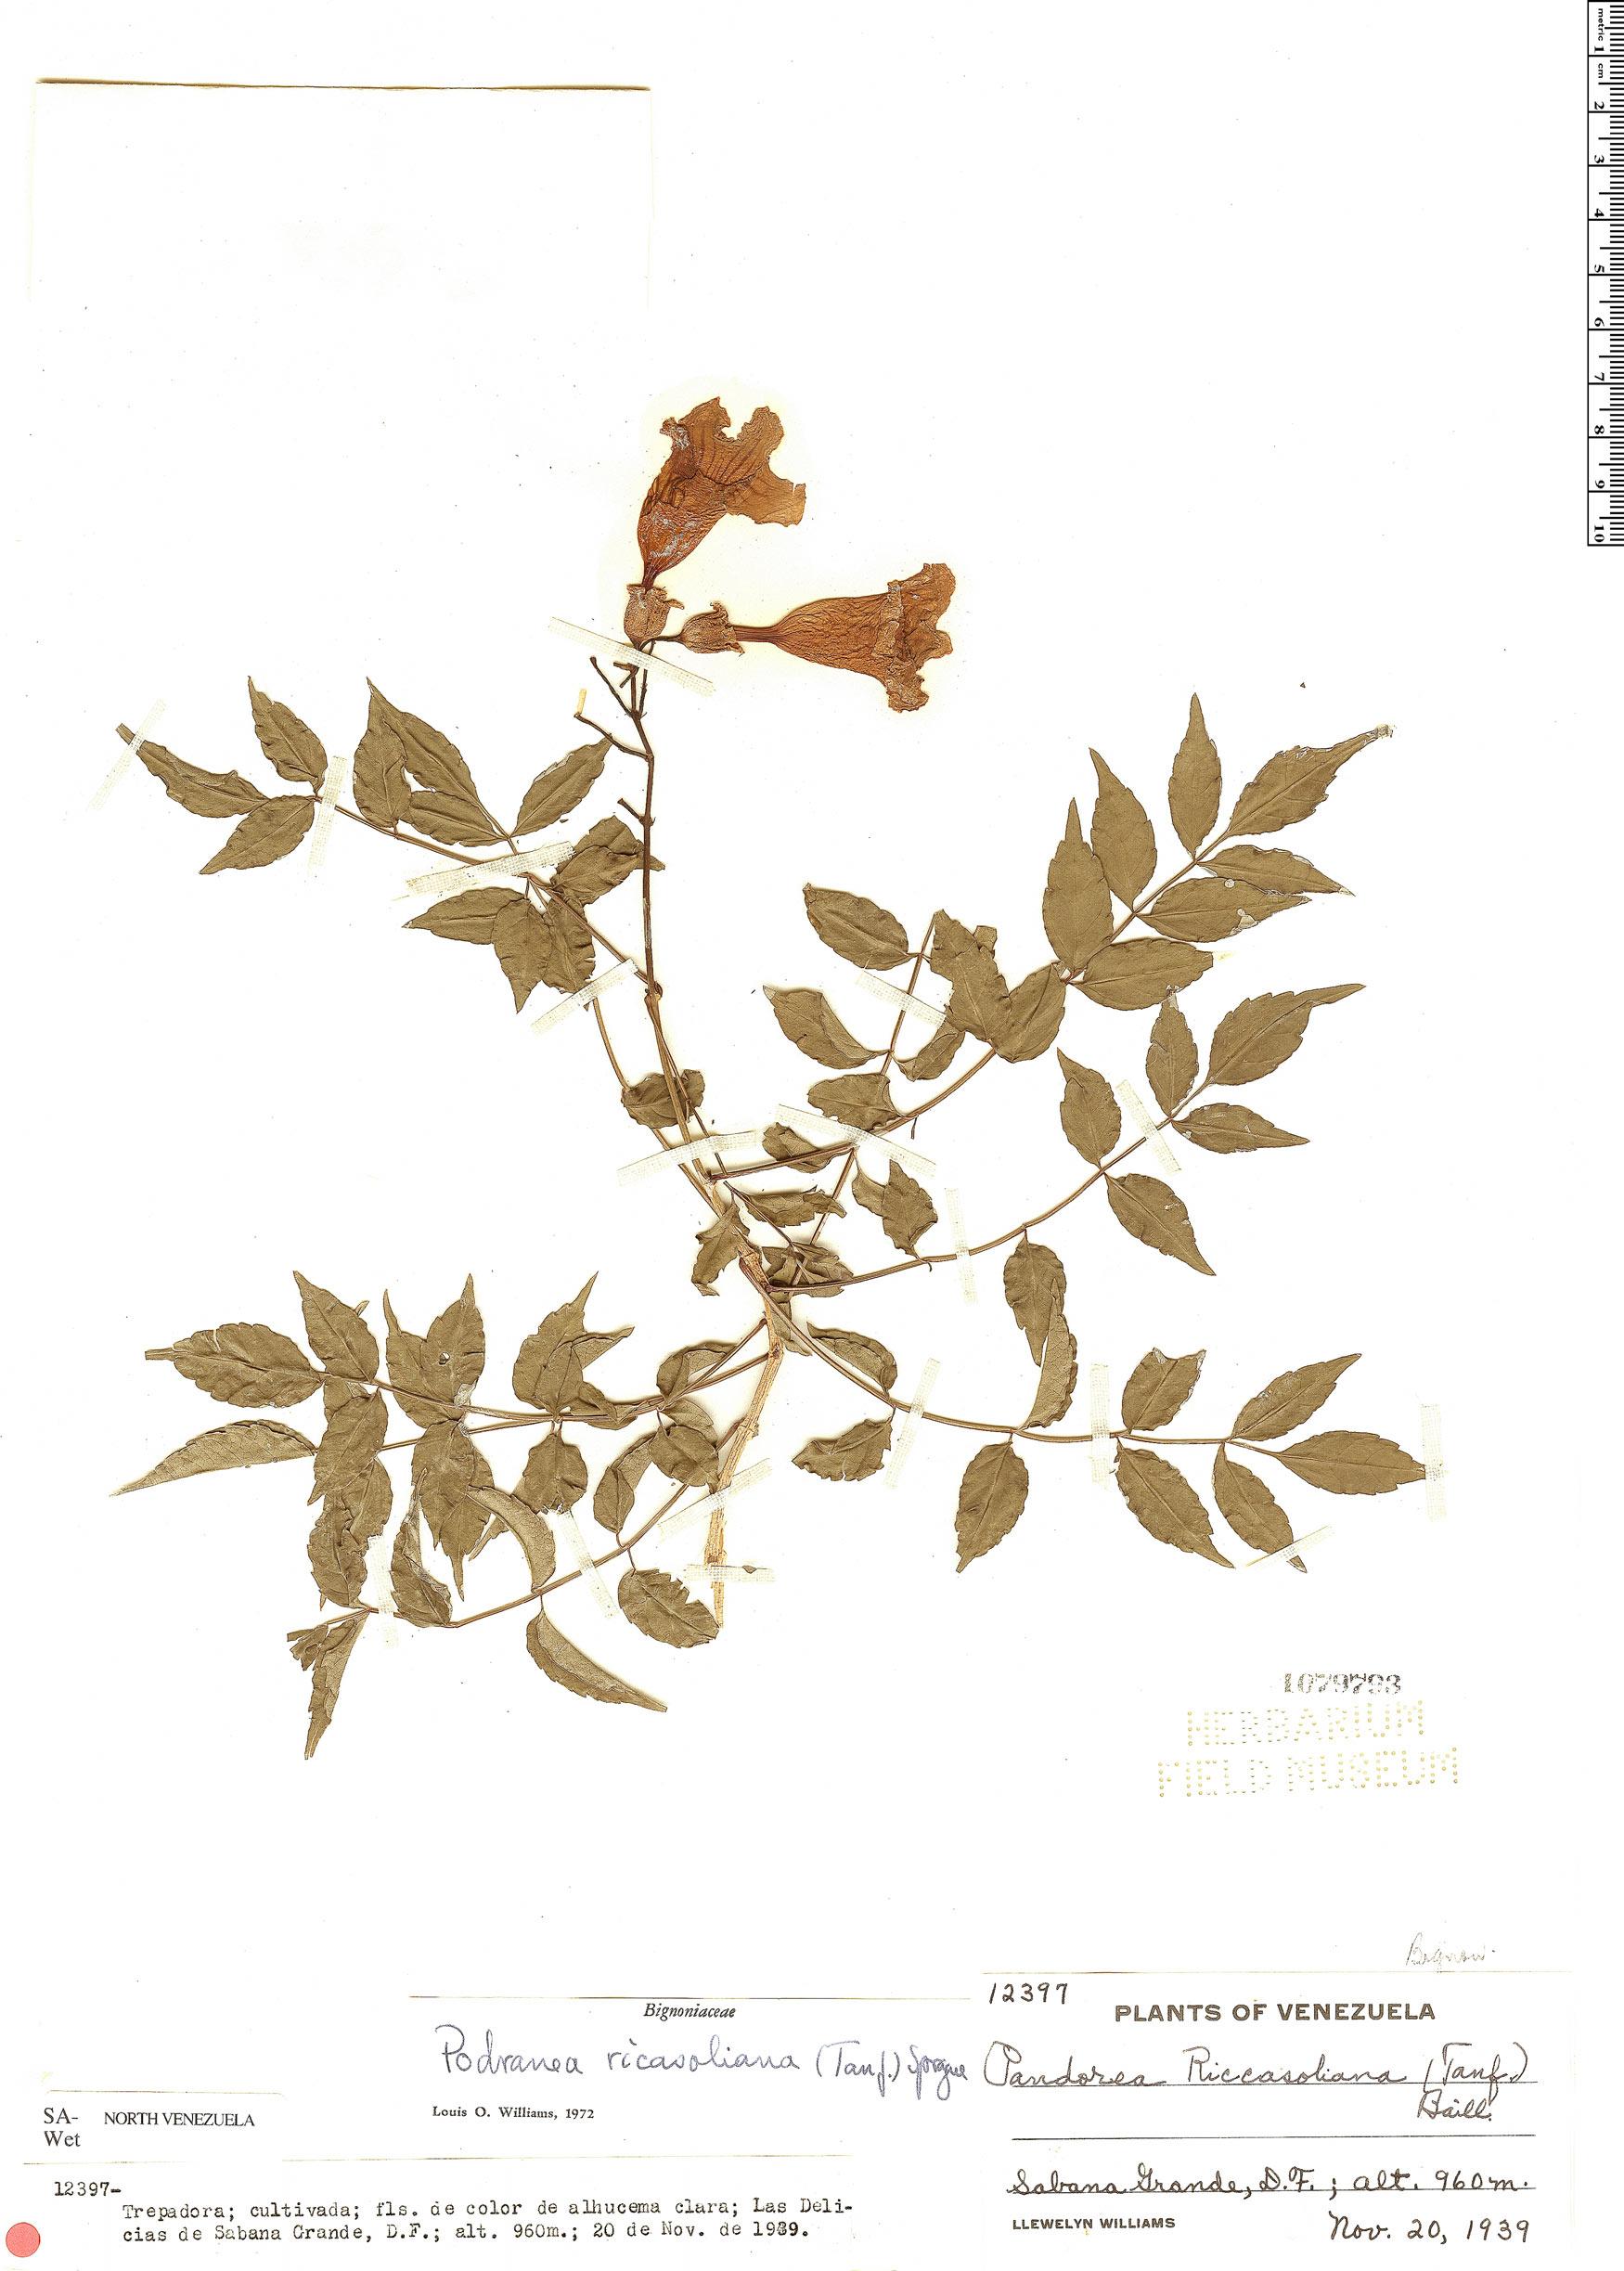 Specimen: Podranea ricasoliana